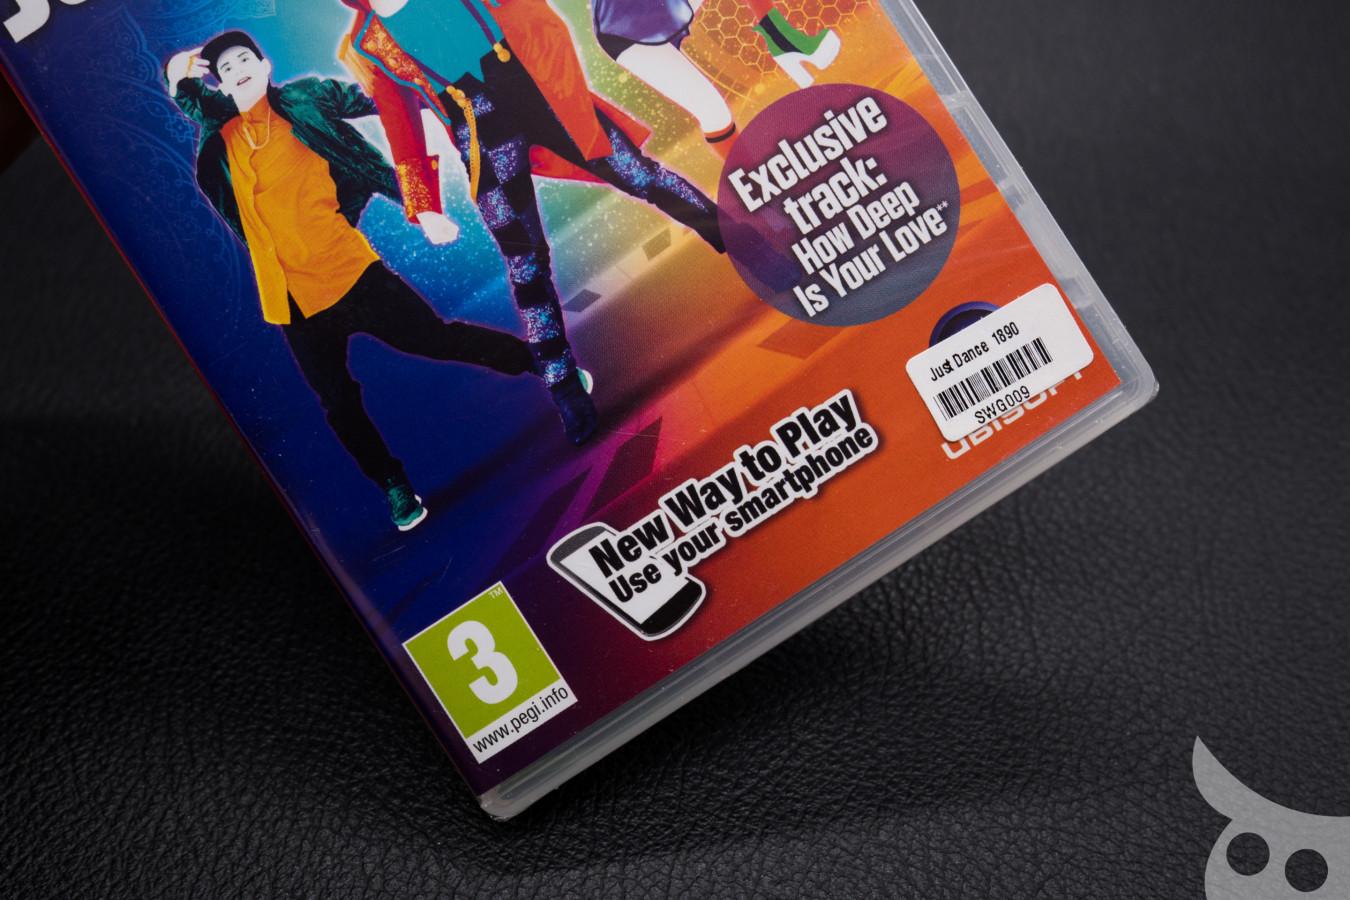 [Nintendo Switch] Just Dance 2017